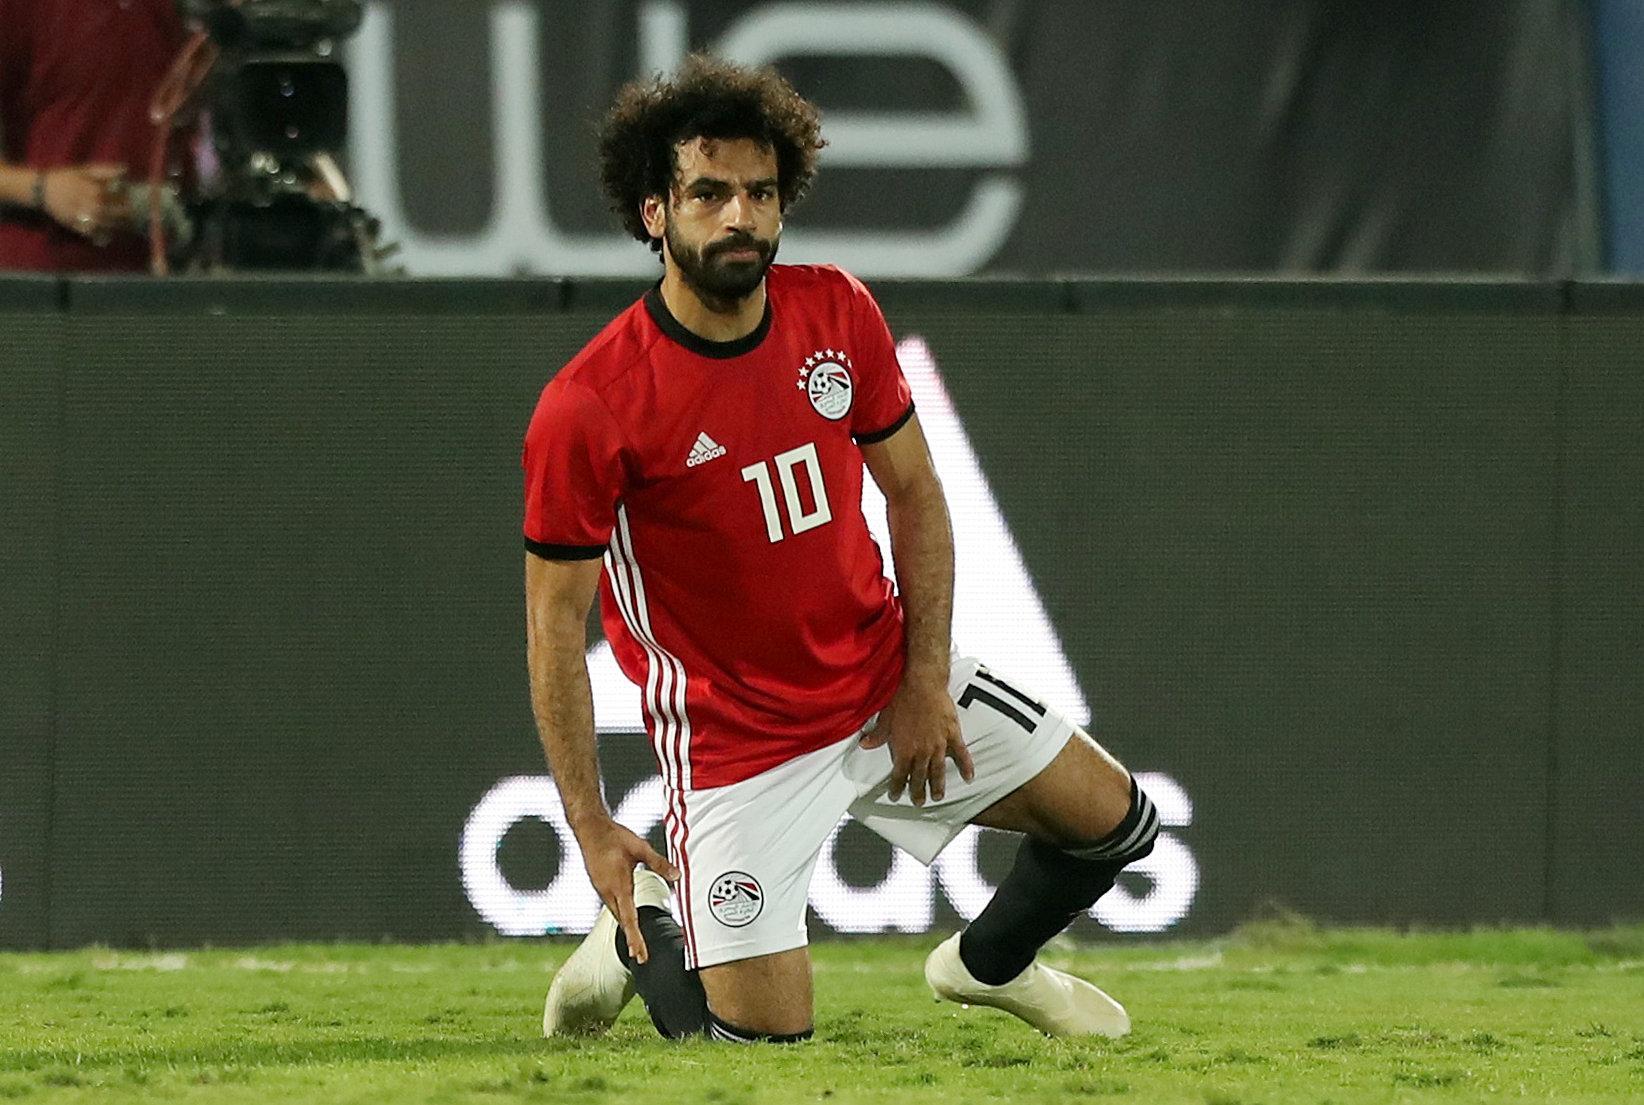 Mohamed Salah Injury Update As Star Returns To Liverpool